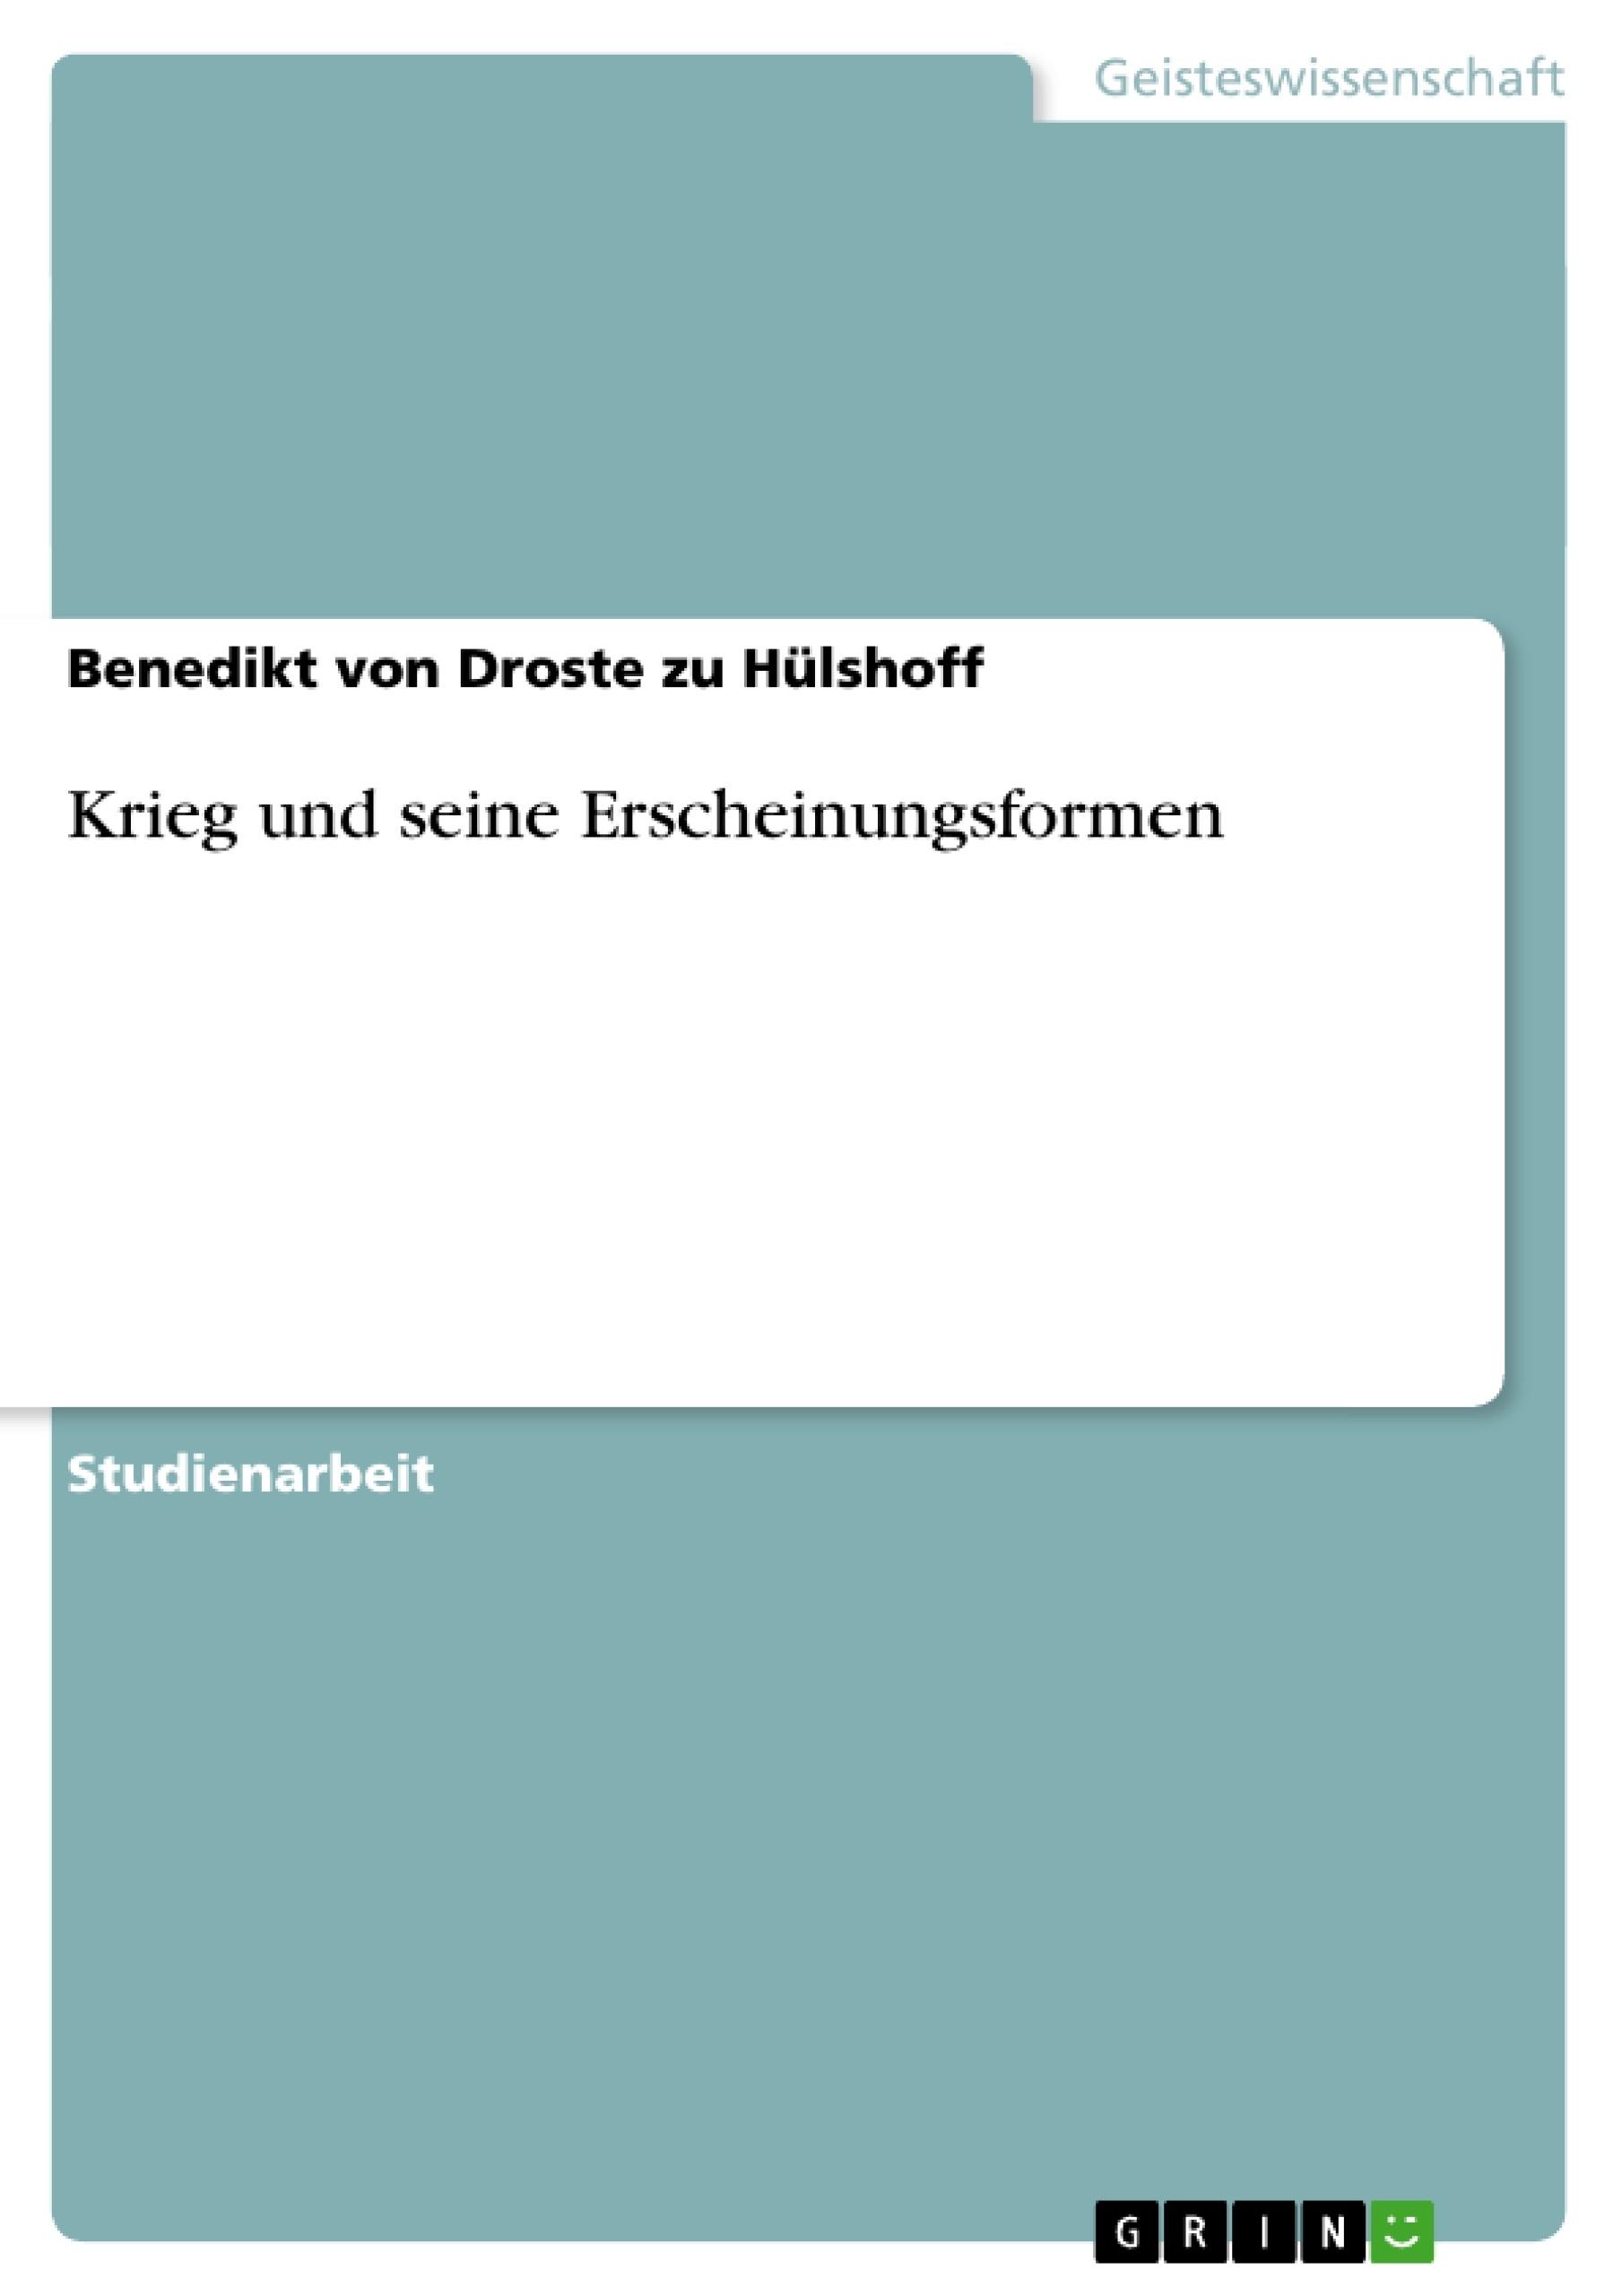 Großzügig Gravitationspotential Energie Arbeitsblatt Zeitgenössisch ...